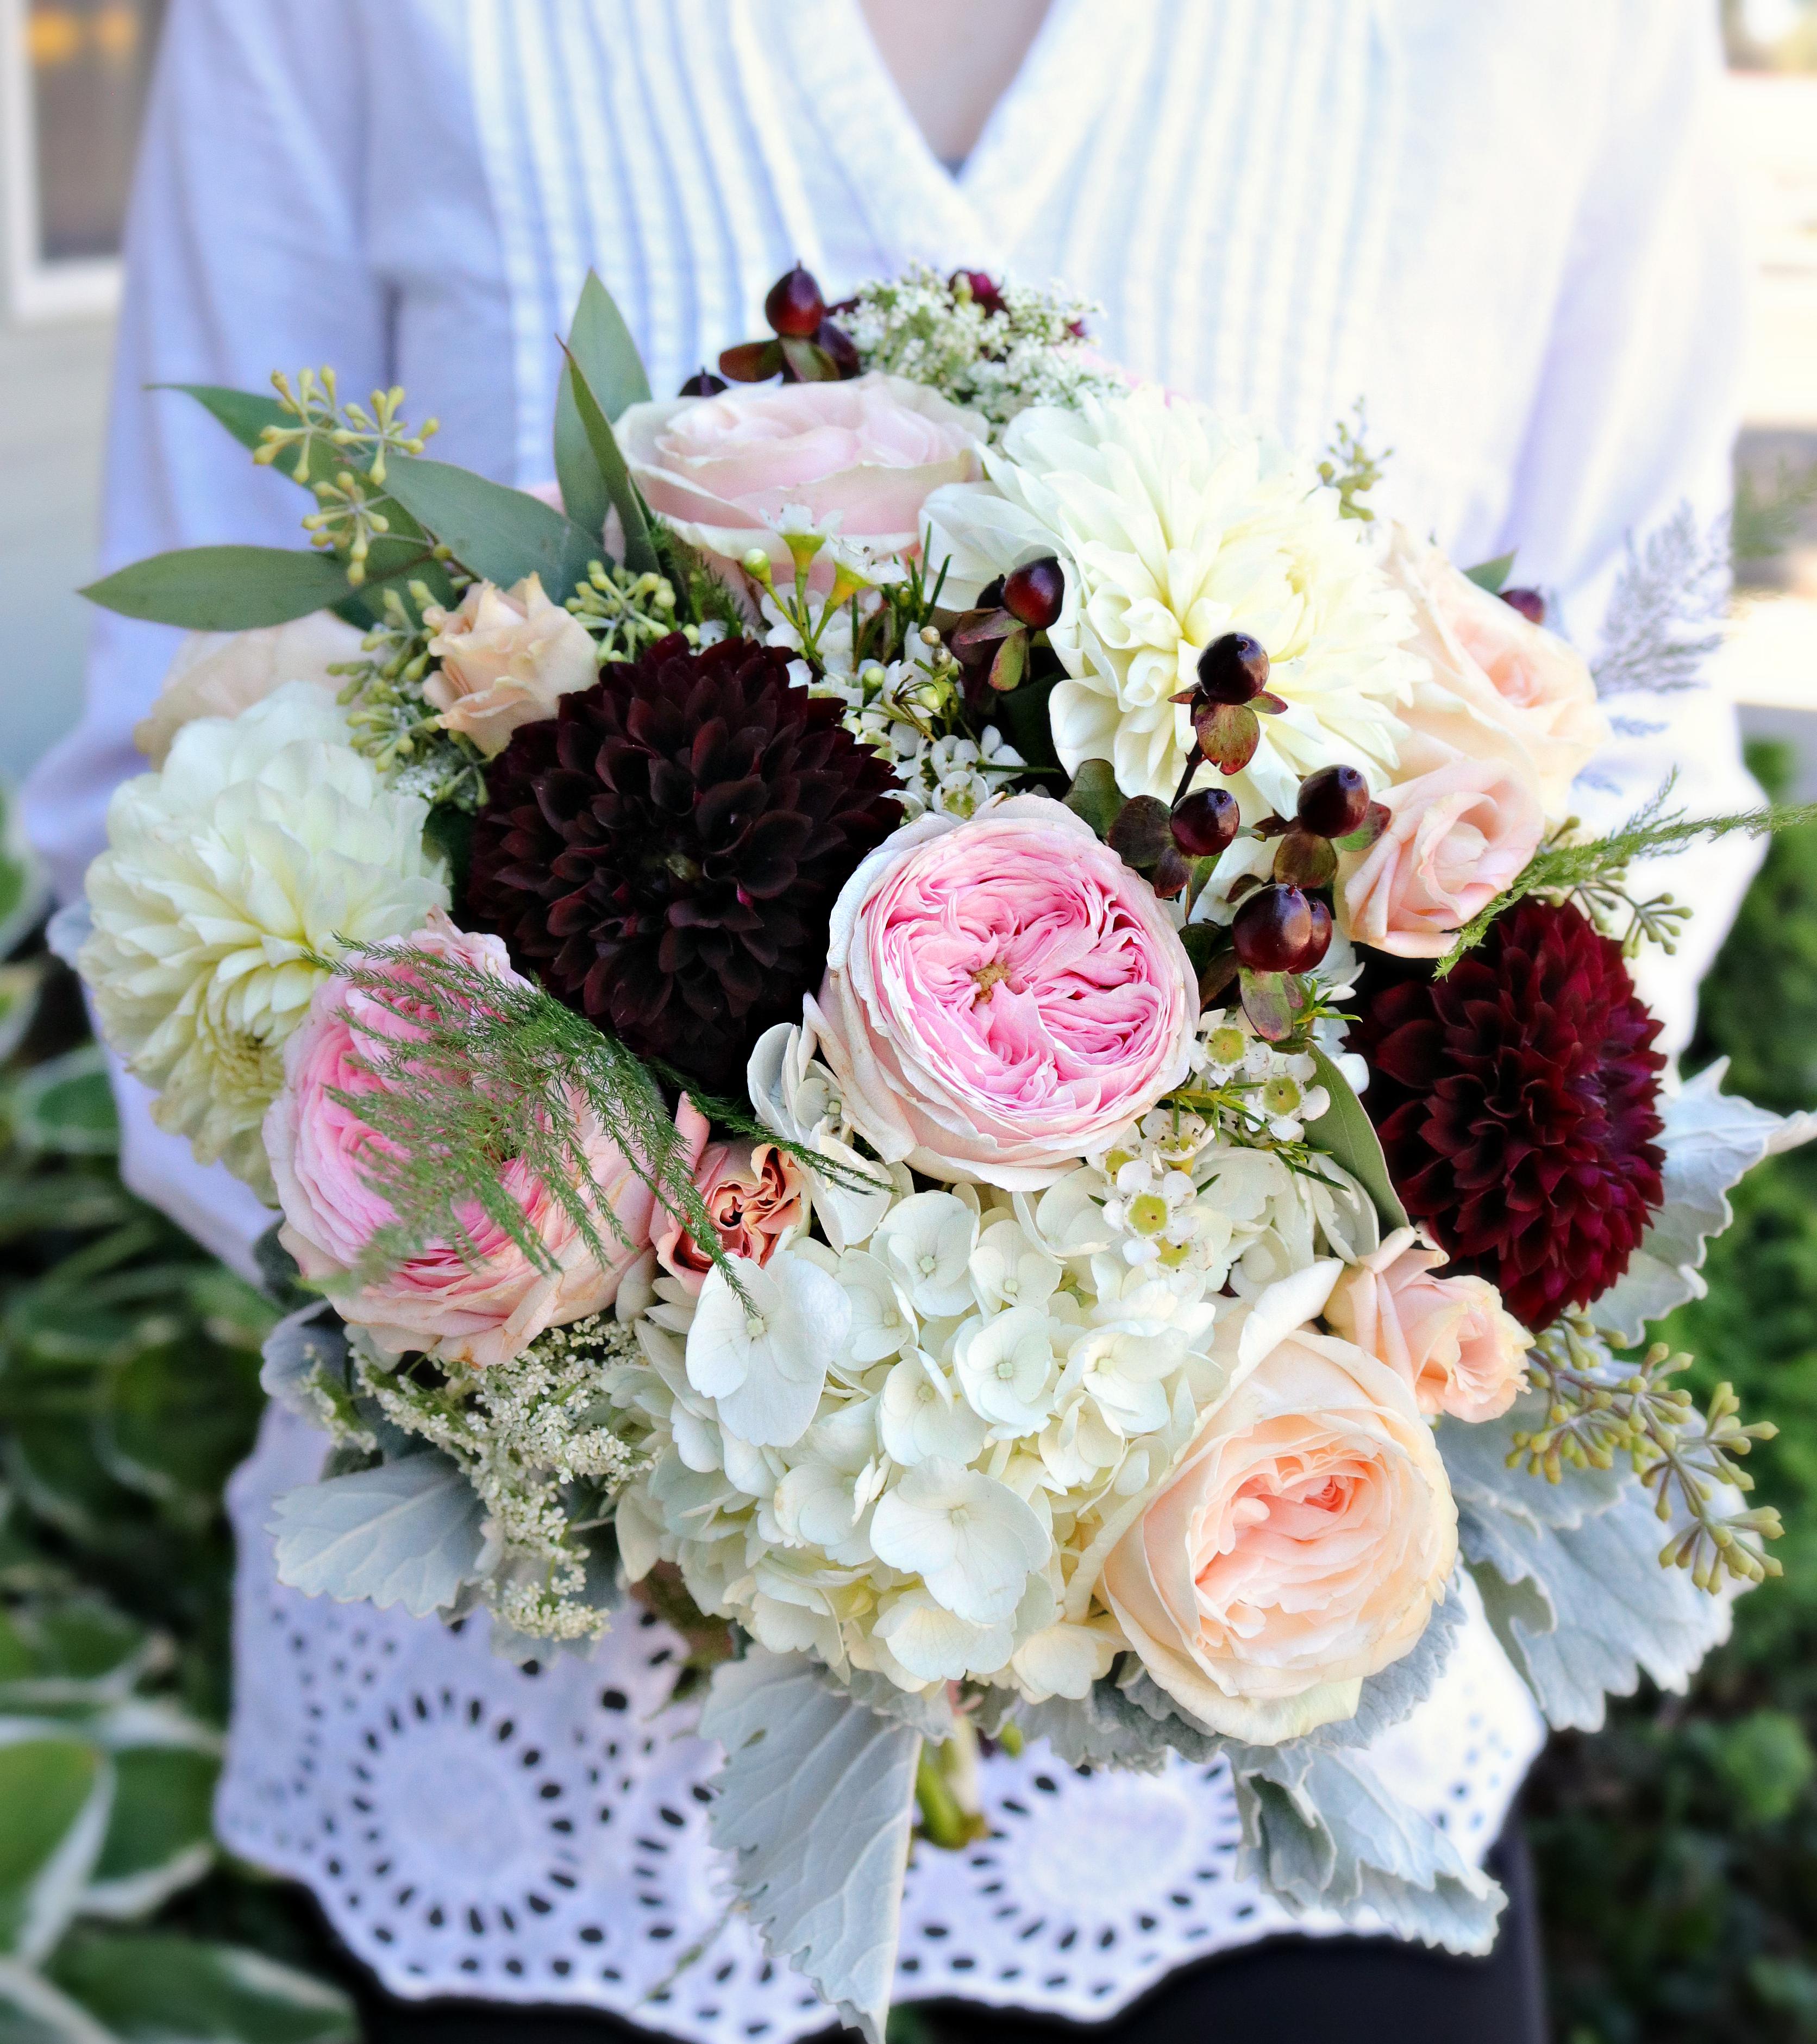 Summer Hand-Tied Bridal Bouquet